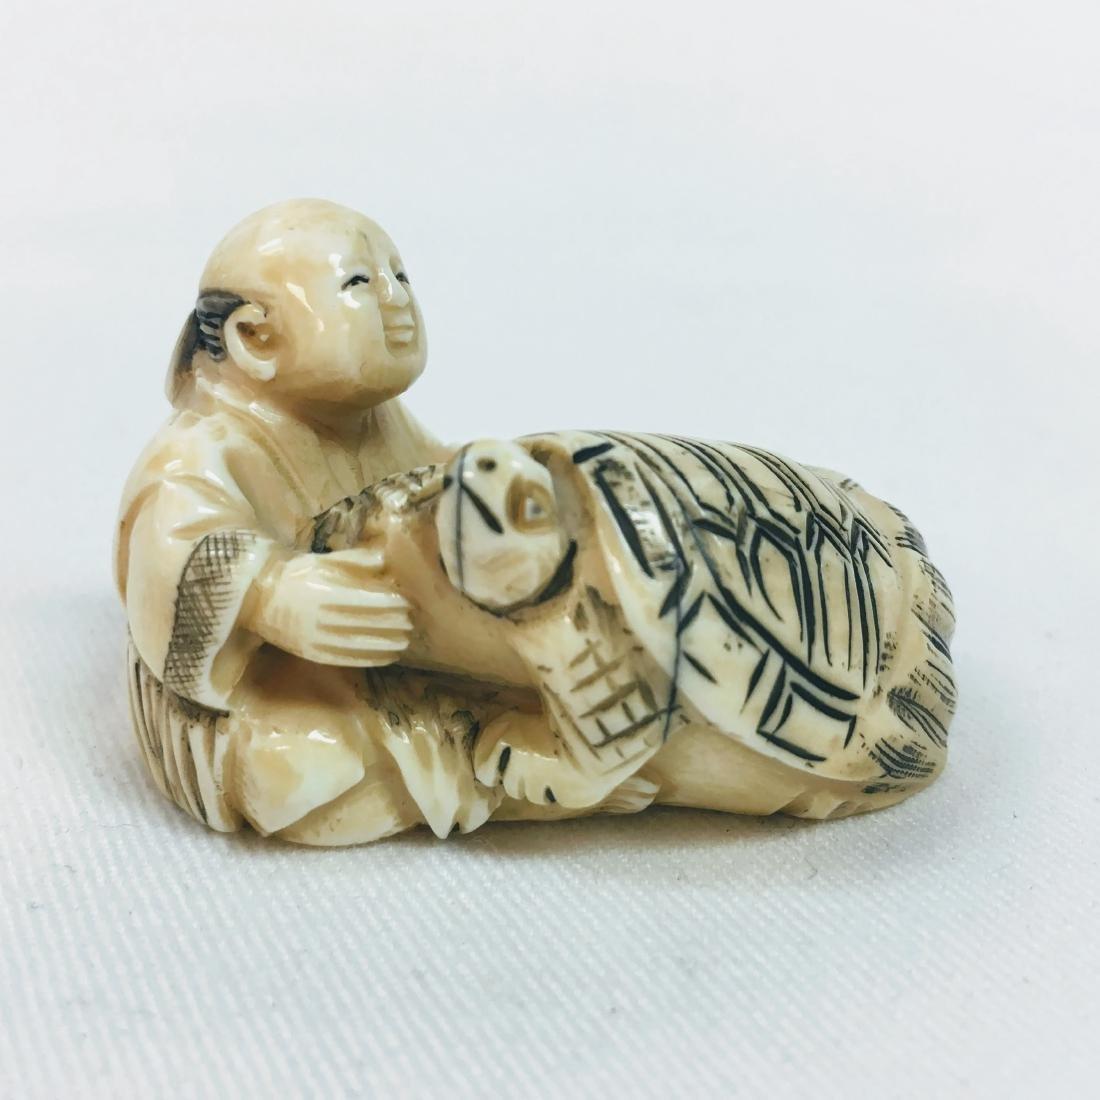 19th Century Netsuke man with turtle figure